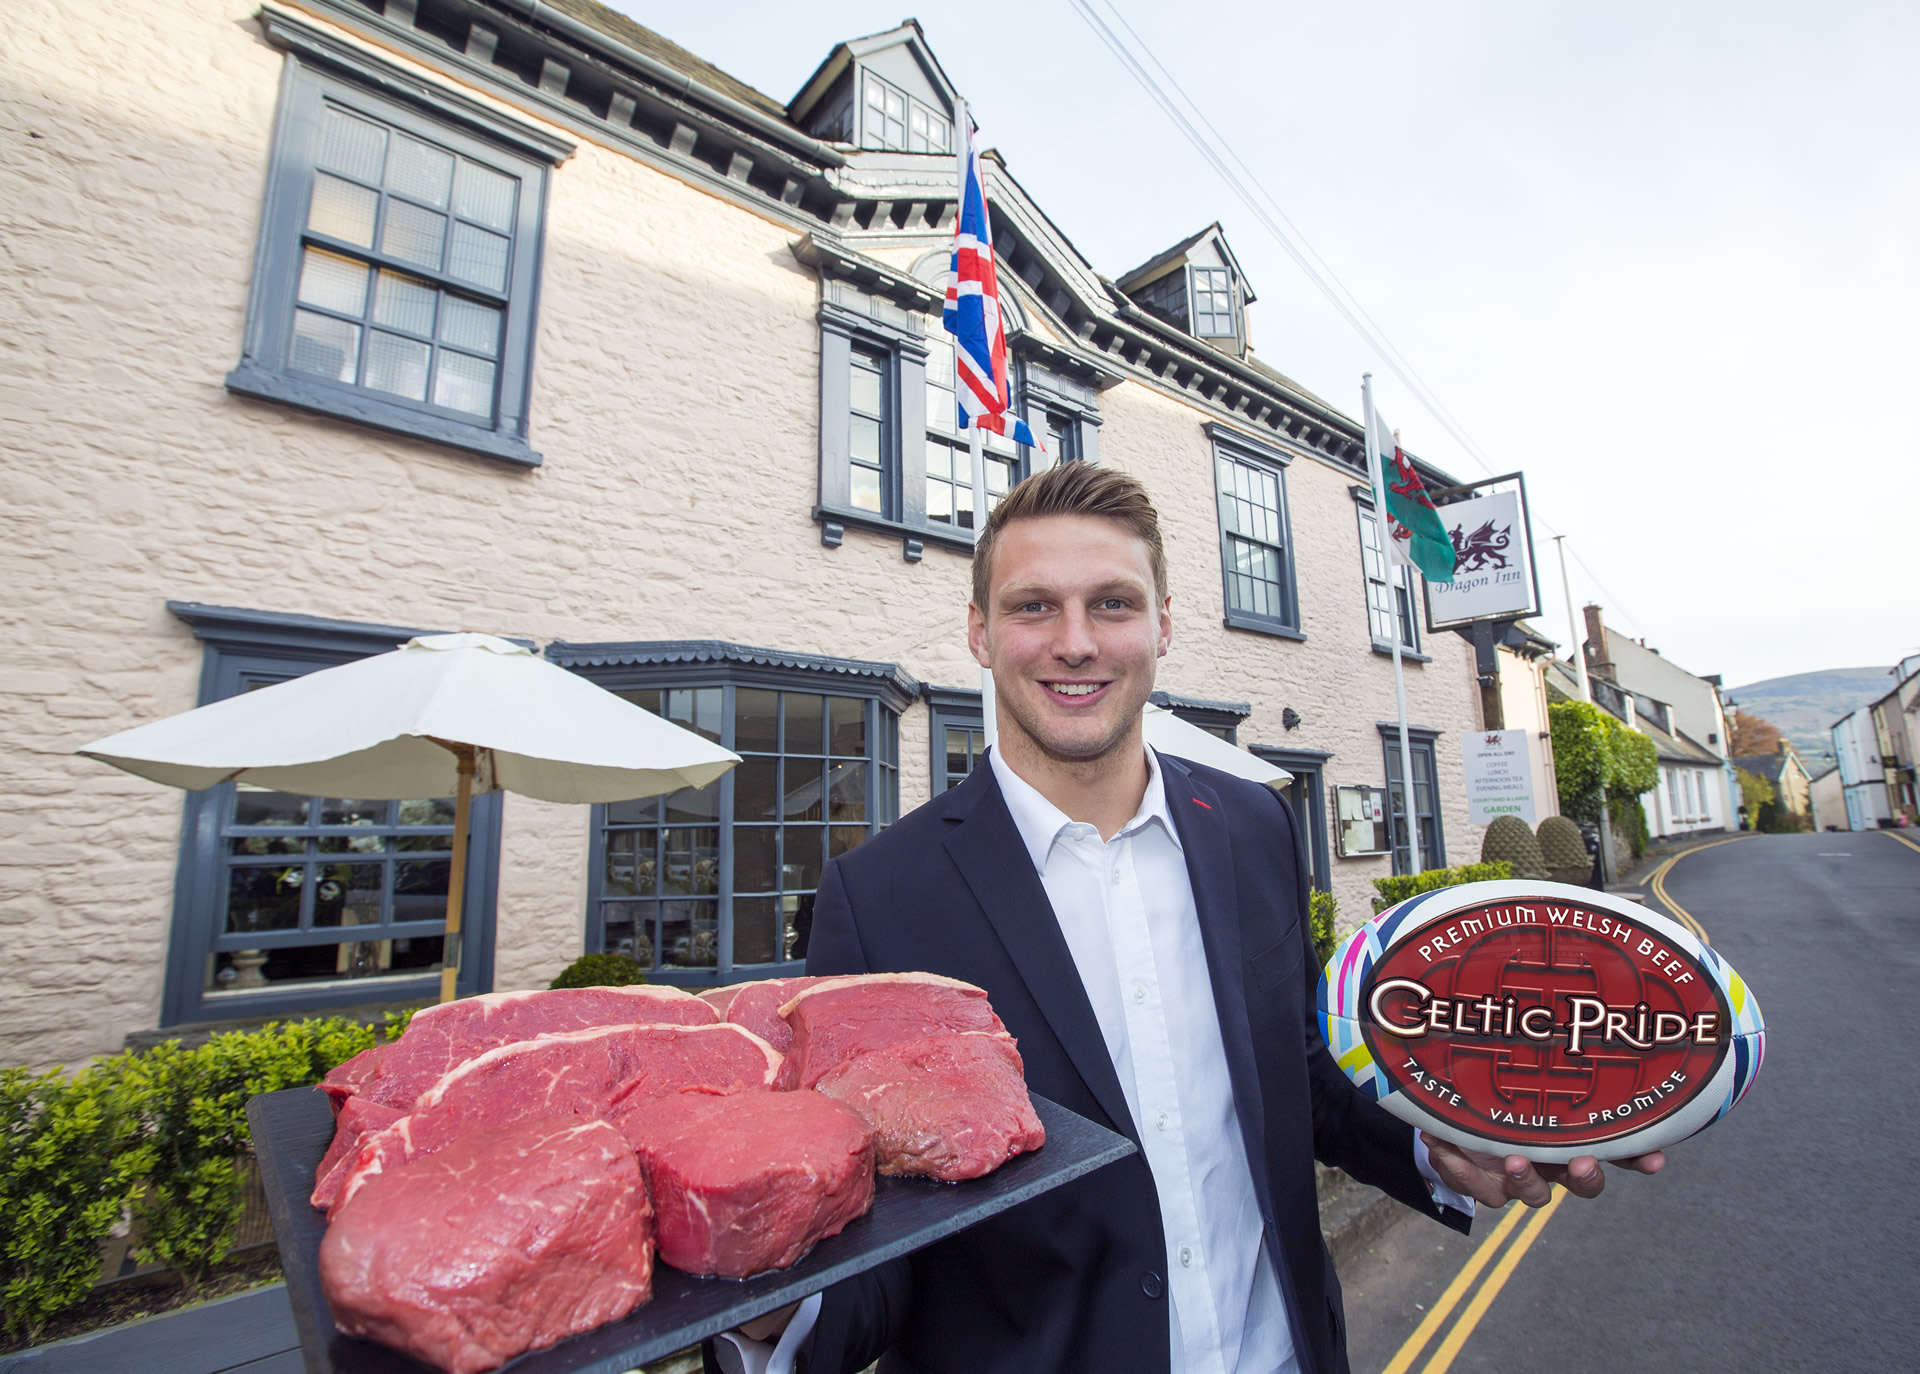 New Celtic Pride Ambassador Dan Biggar at The Dragon Inn, Crickhowell.